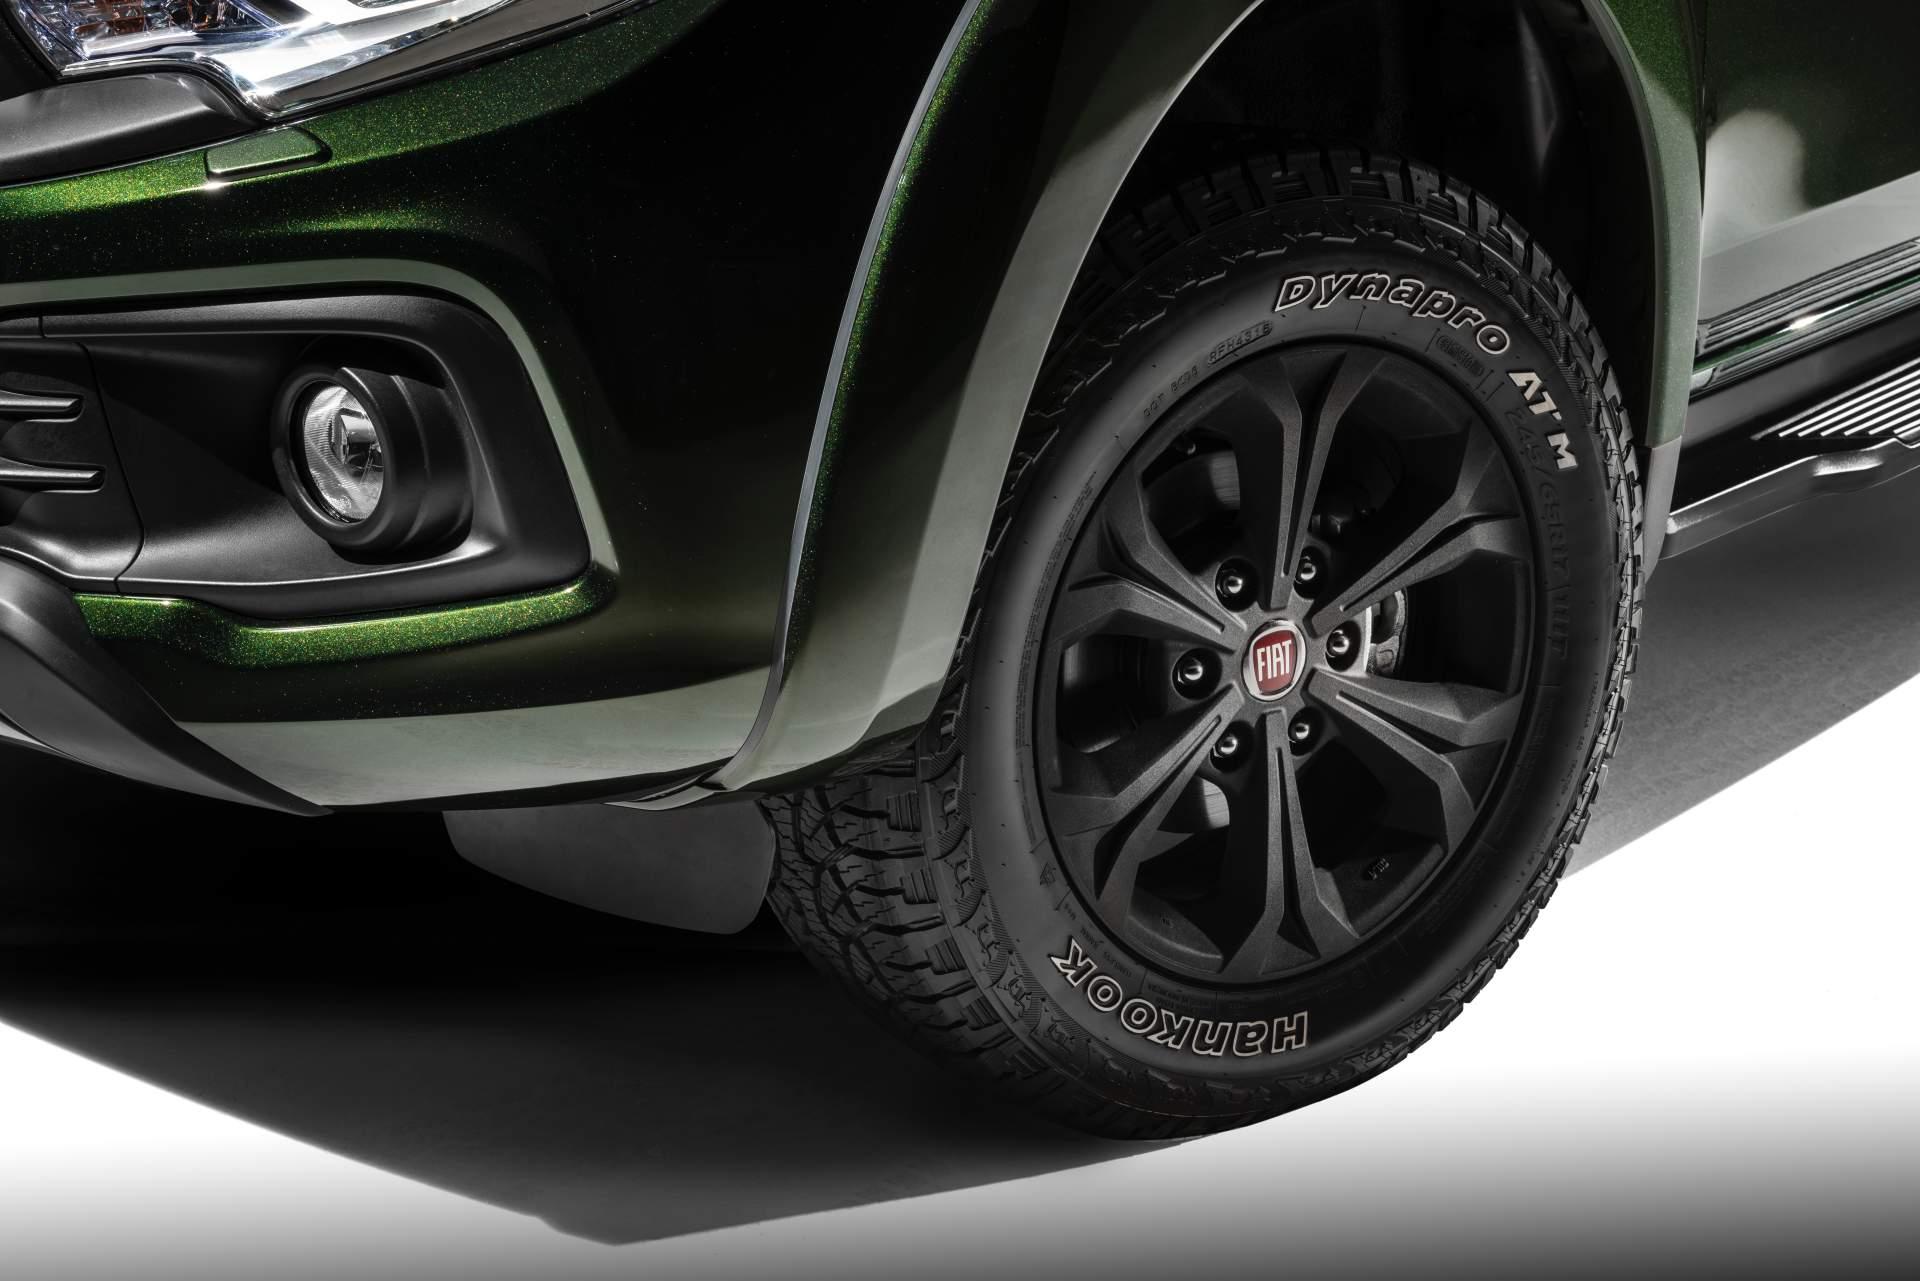 Fiat_Fullback_Cross_Concept_by_Garage_Italia_Customs_0002